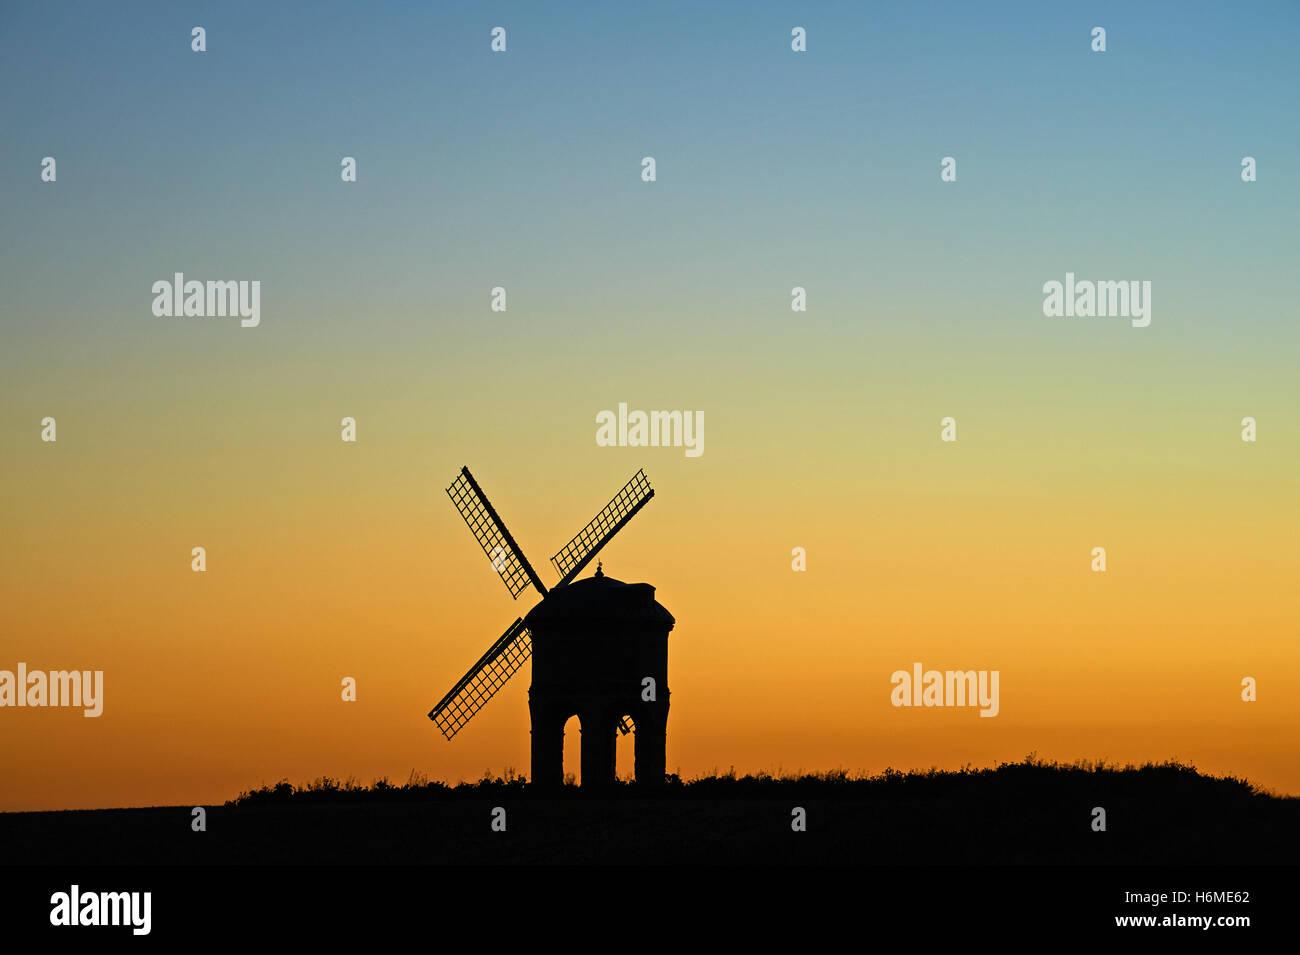 chesterton windmill silhouette stock photos chesterton windmill